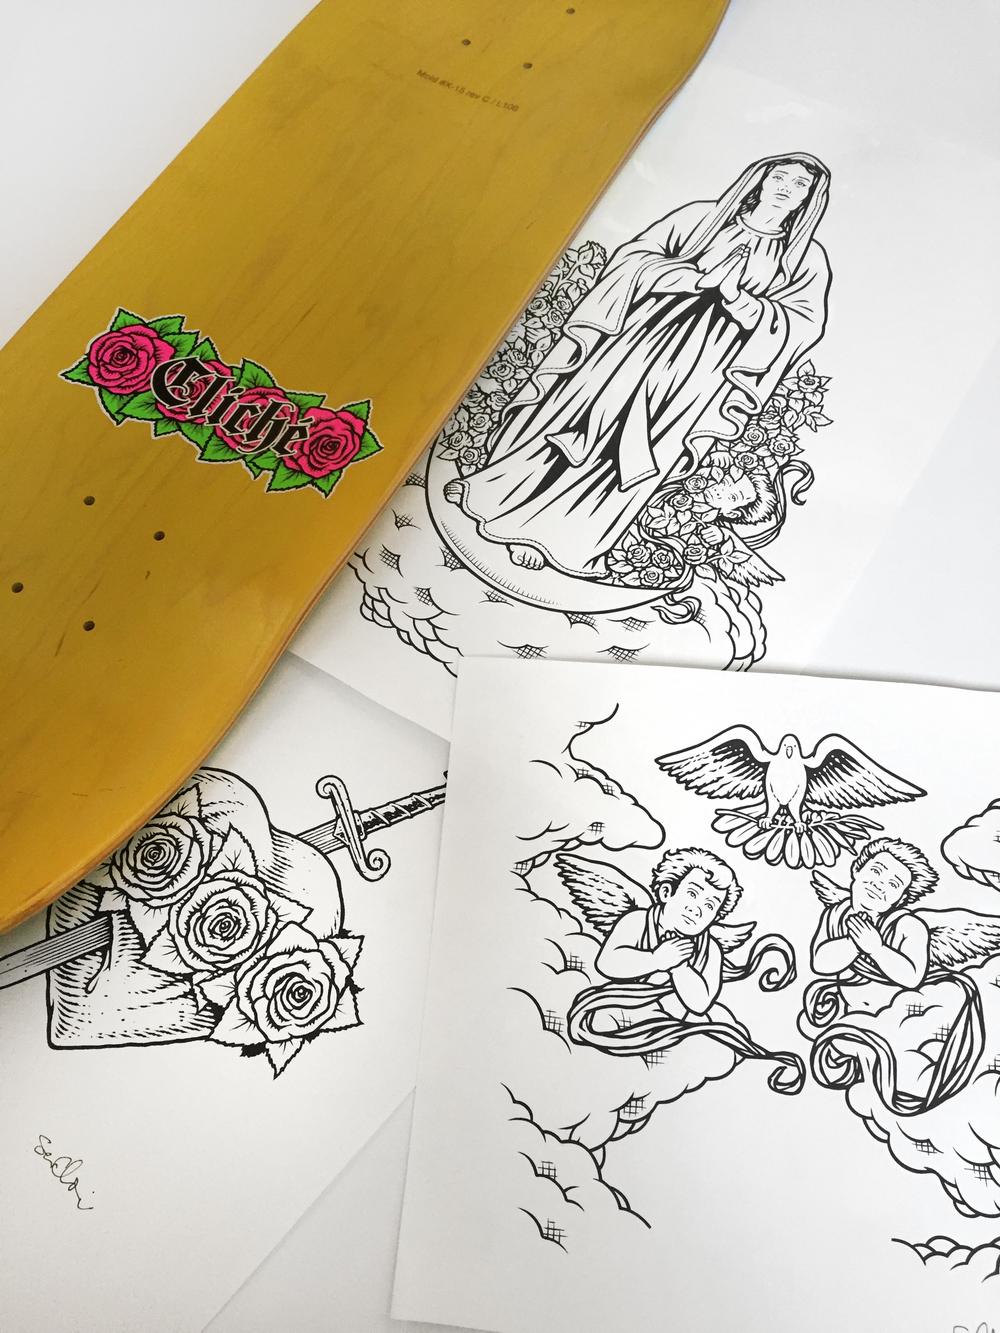 cliche skateboards virgin mary 101 jesus tribute art by sean cliver